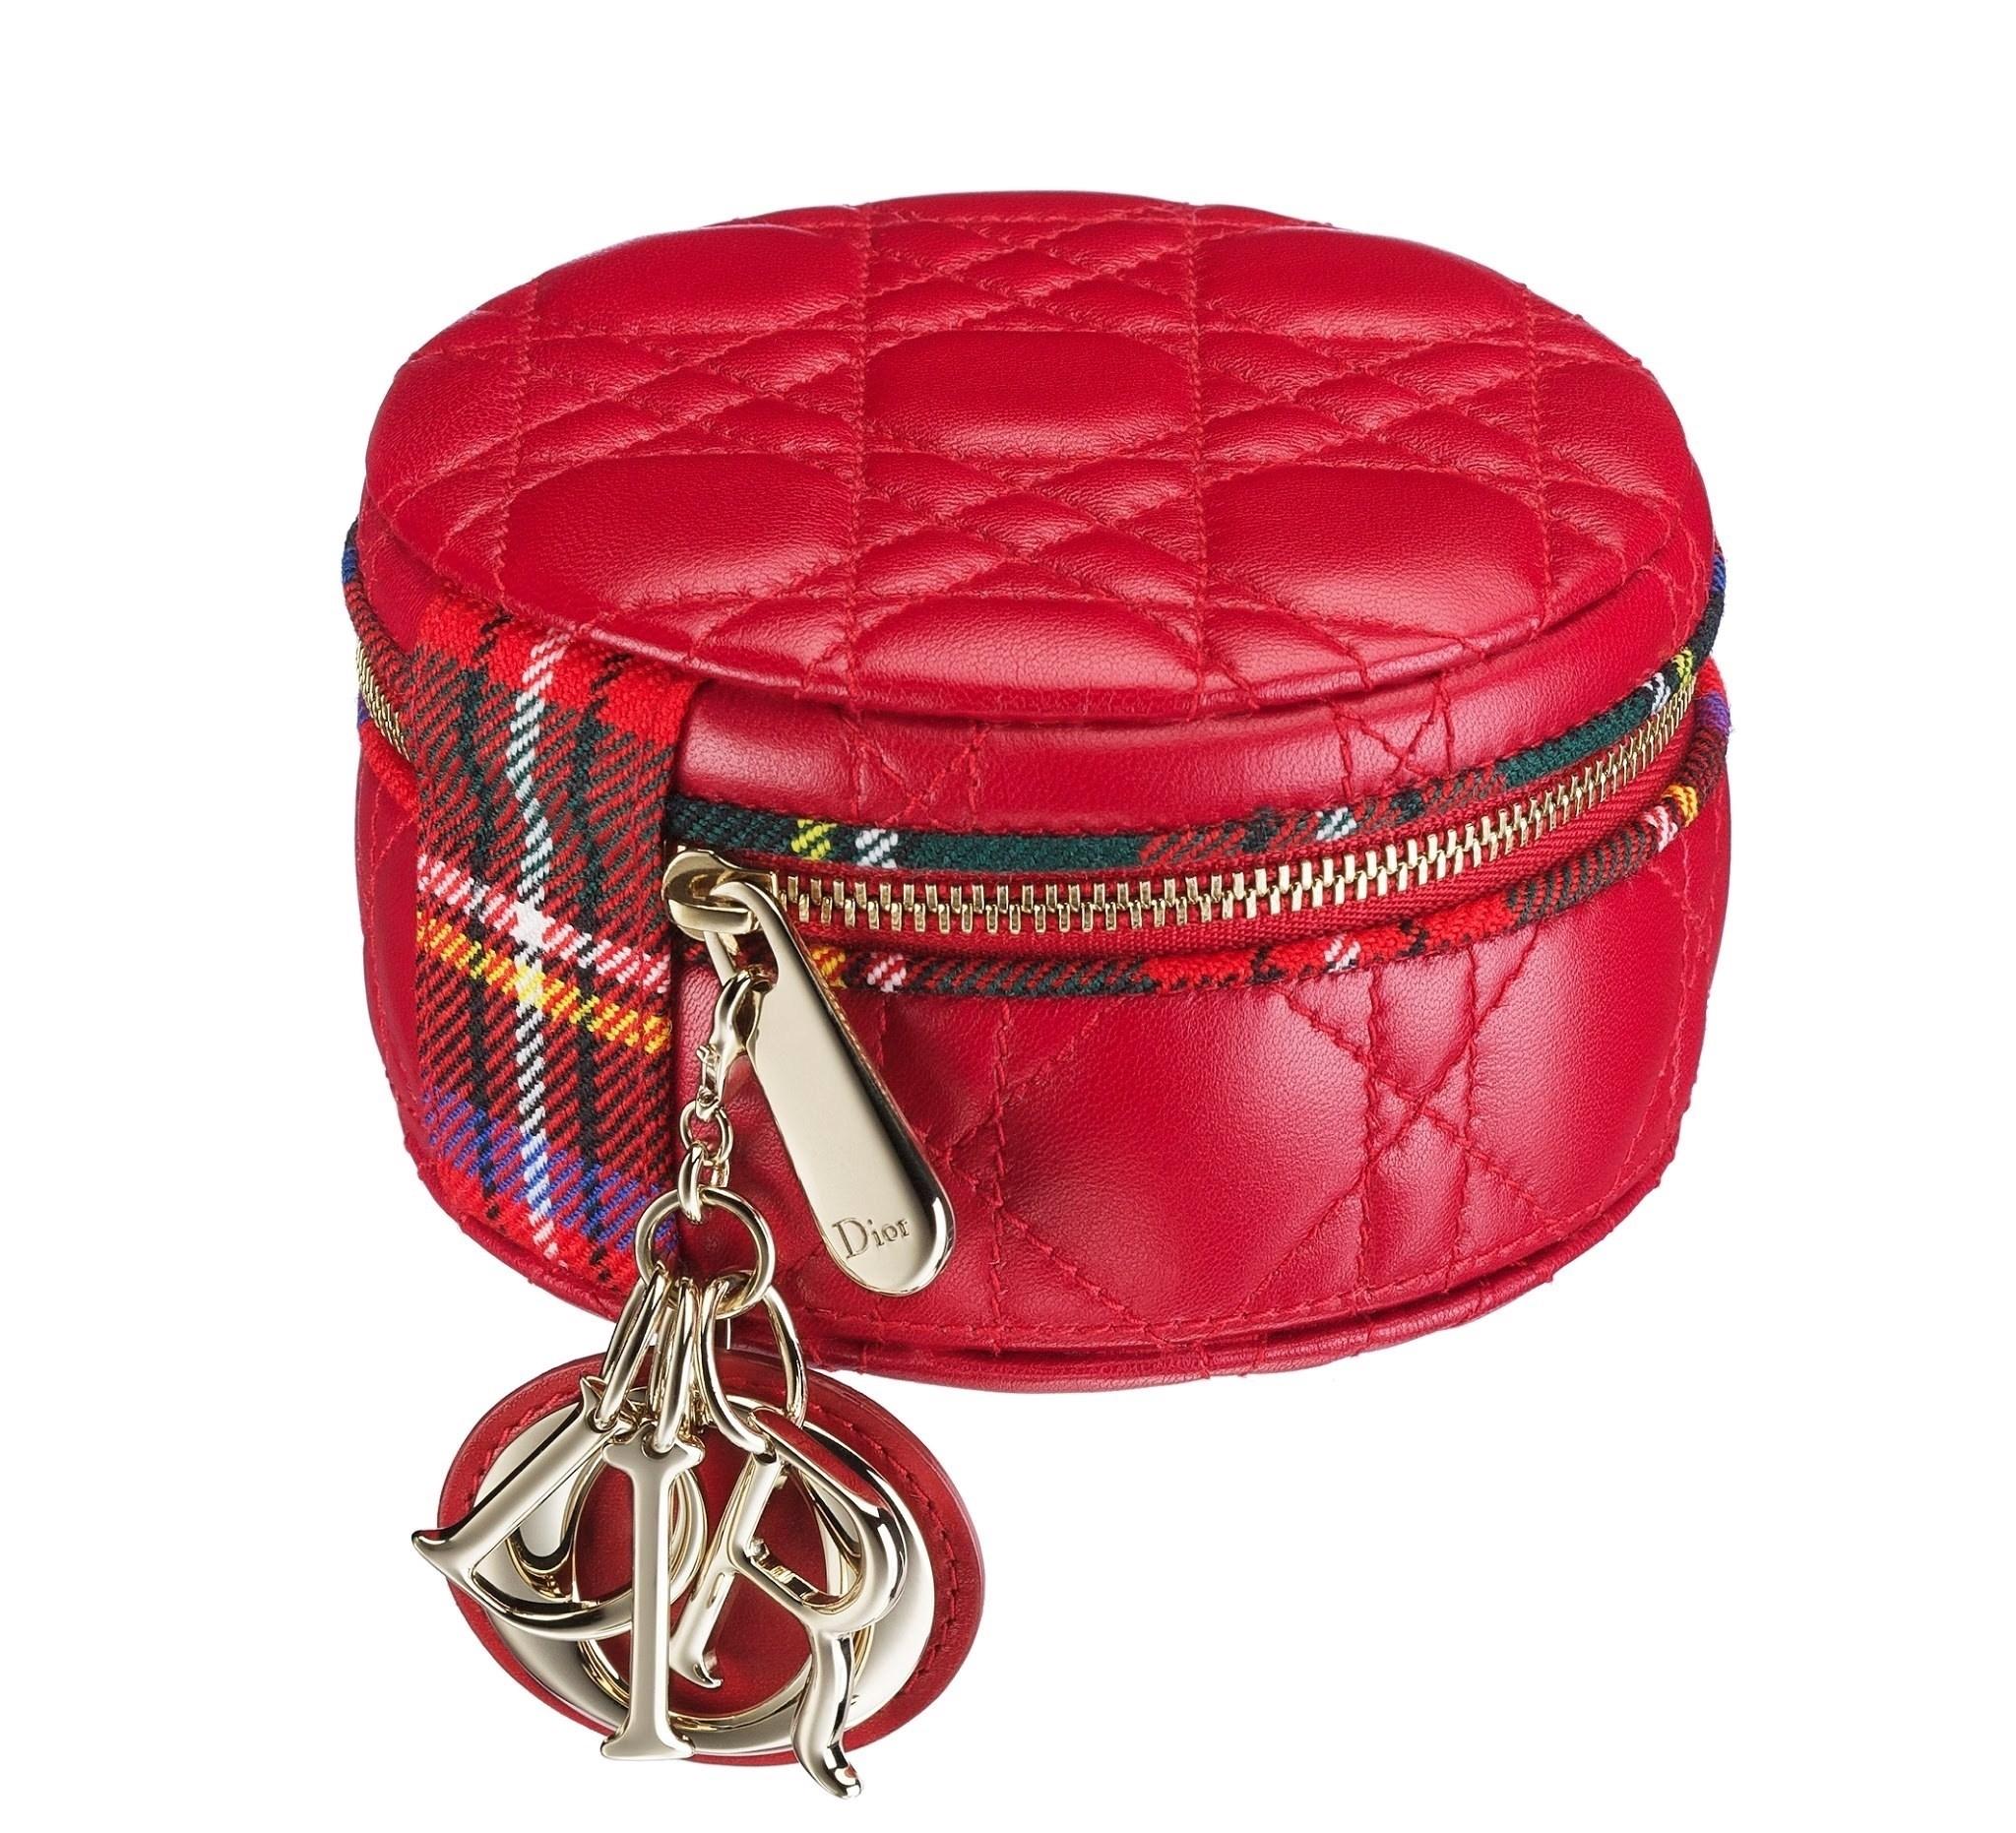 Christian-Dior-Jewelry-case-in-red-lambskin